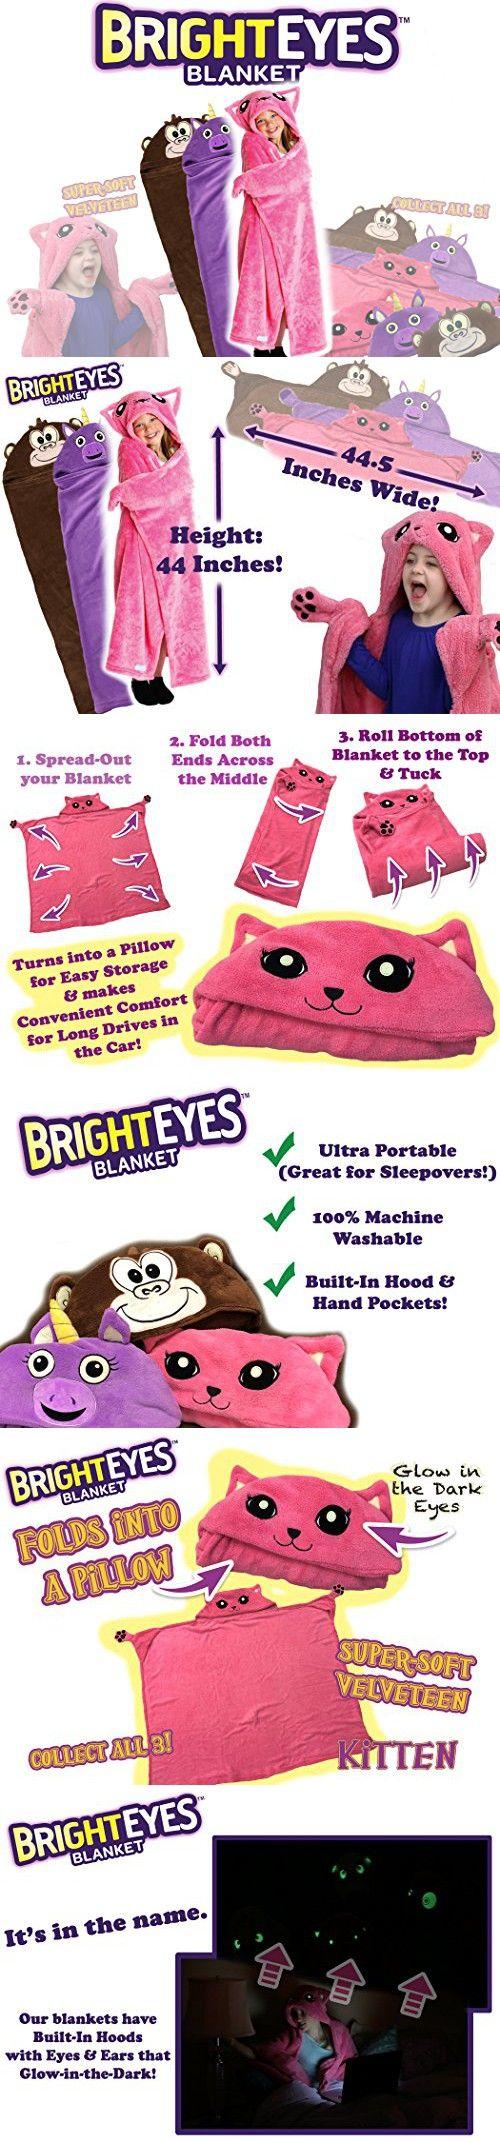 Bright Eyes Blanket Super Soft Snuggie For Kids Hooded Blanket Robe Comfy Throw Blanket Pink Kitten Warm Fuzzy In 2020 Eye Blanket Fuzzy Blanket Bright Eyes